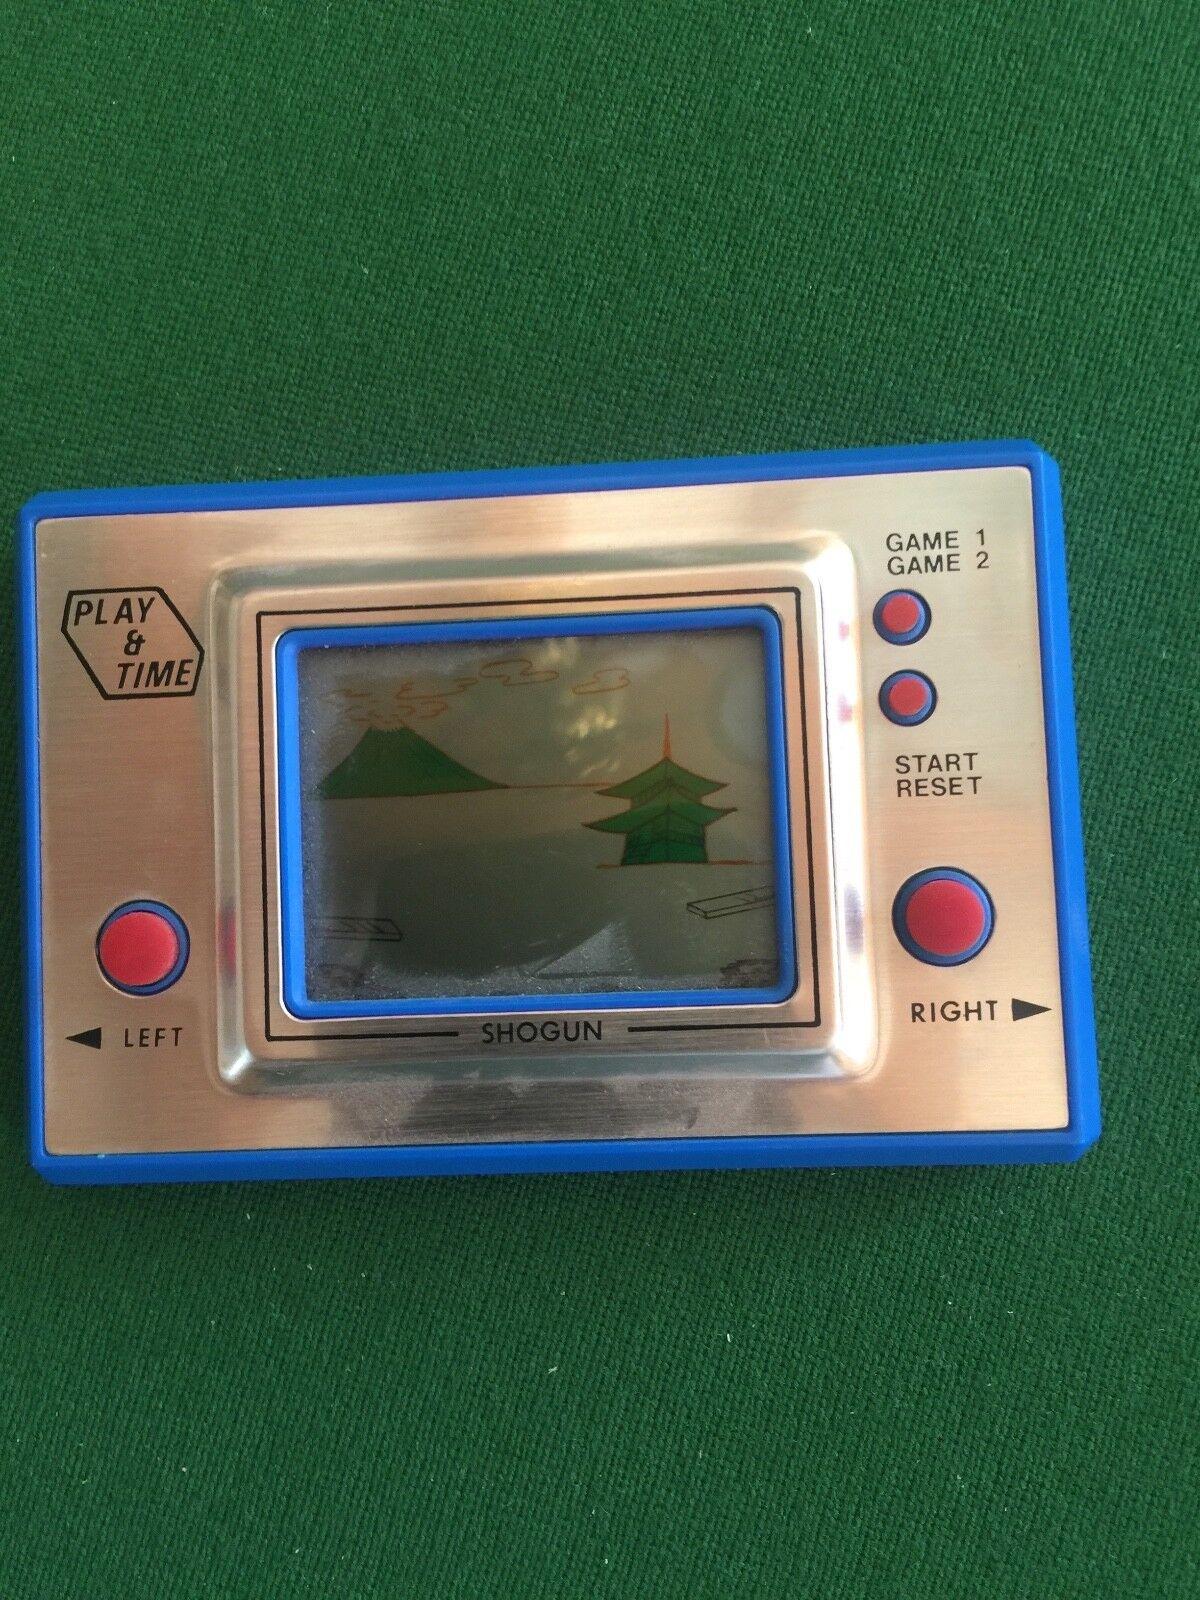 Play&Time  Shogun' extrêmement rare pour collectionneur agreeni